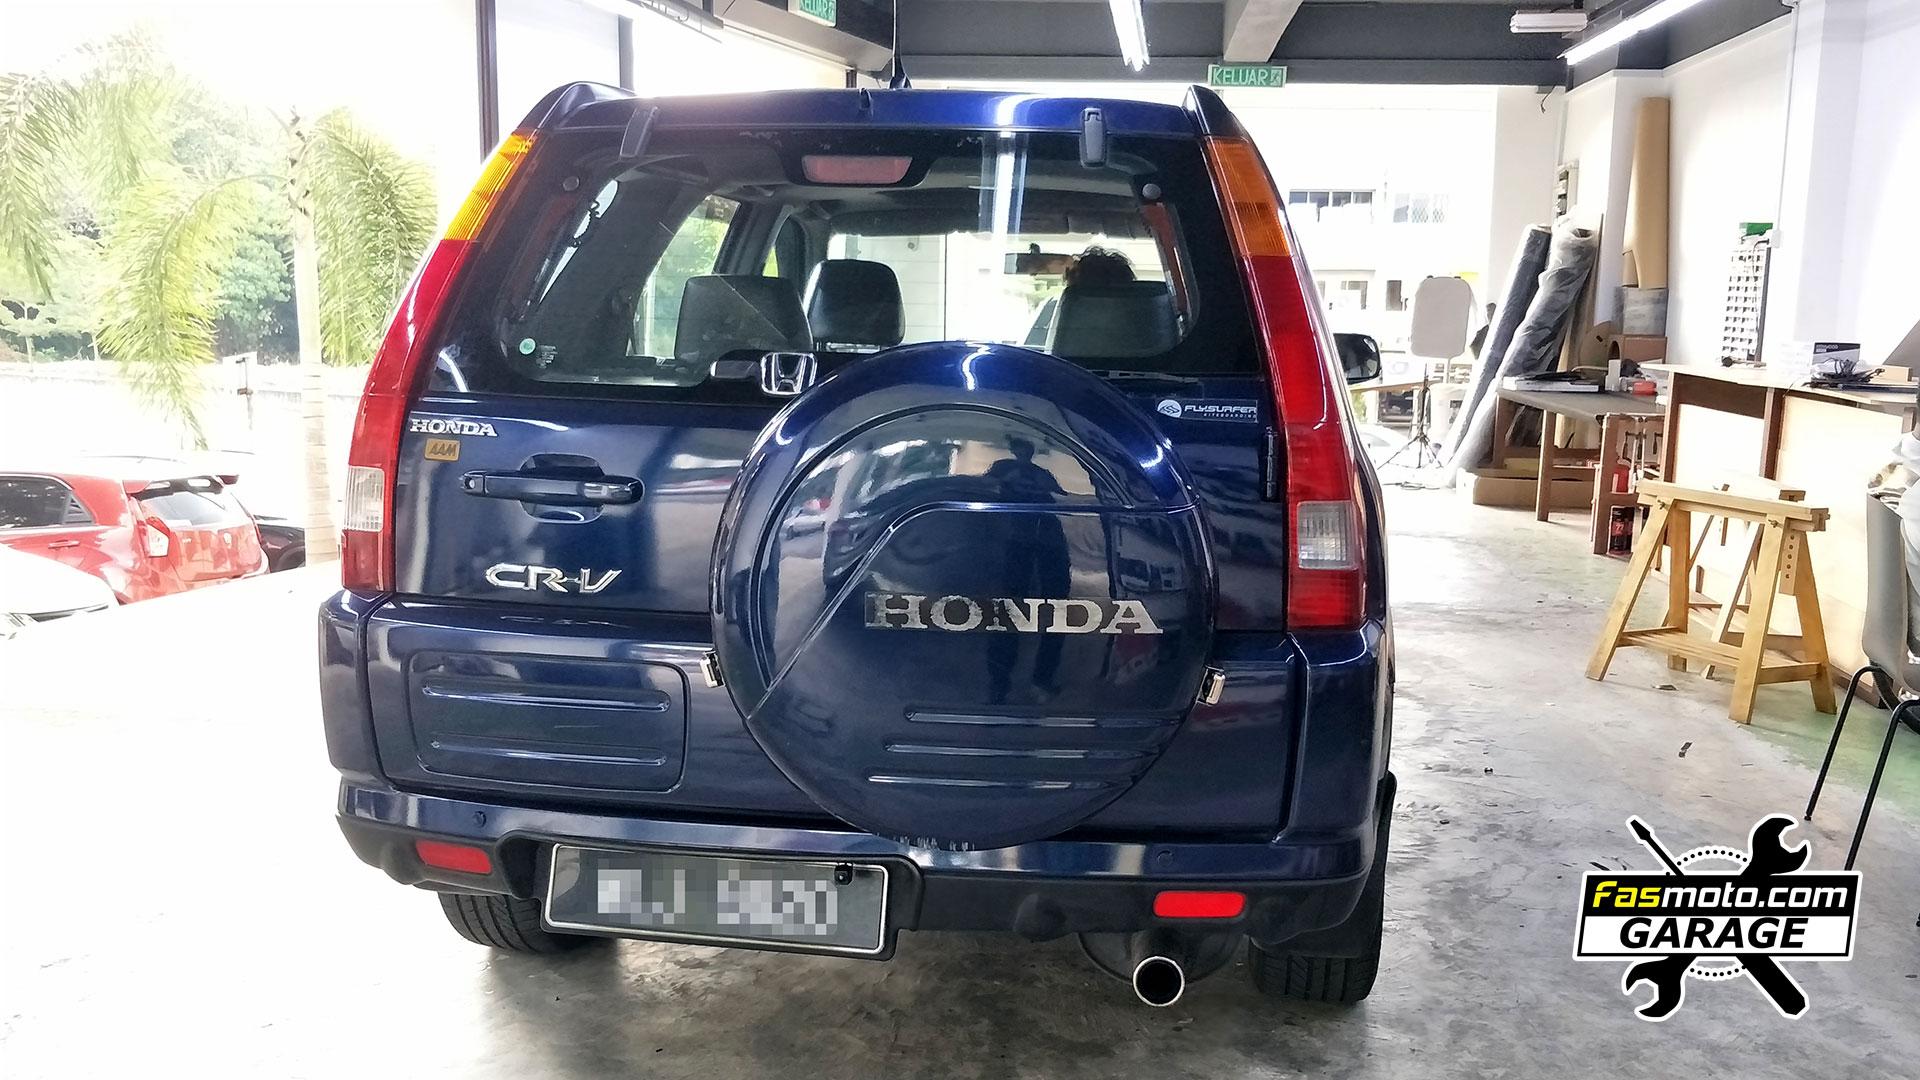 Honda CR-V 2nd Gen Kenwood DMX5020S and Blaupunkt RC 3 Reverse Camera